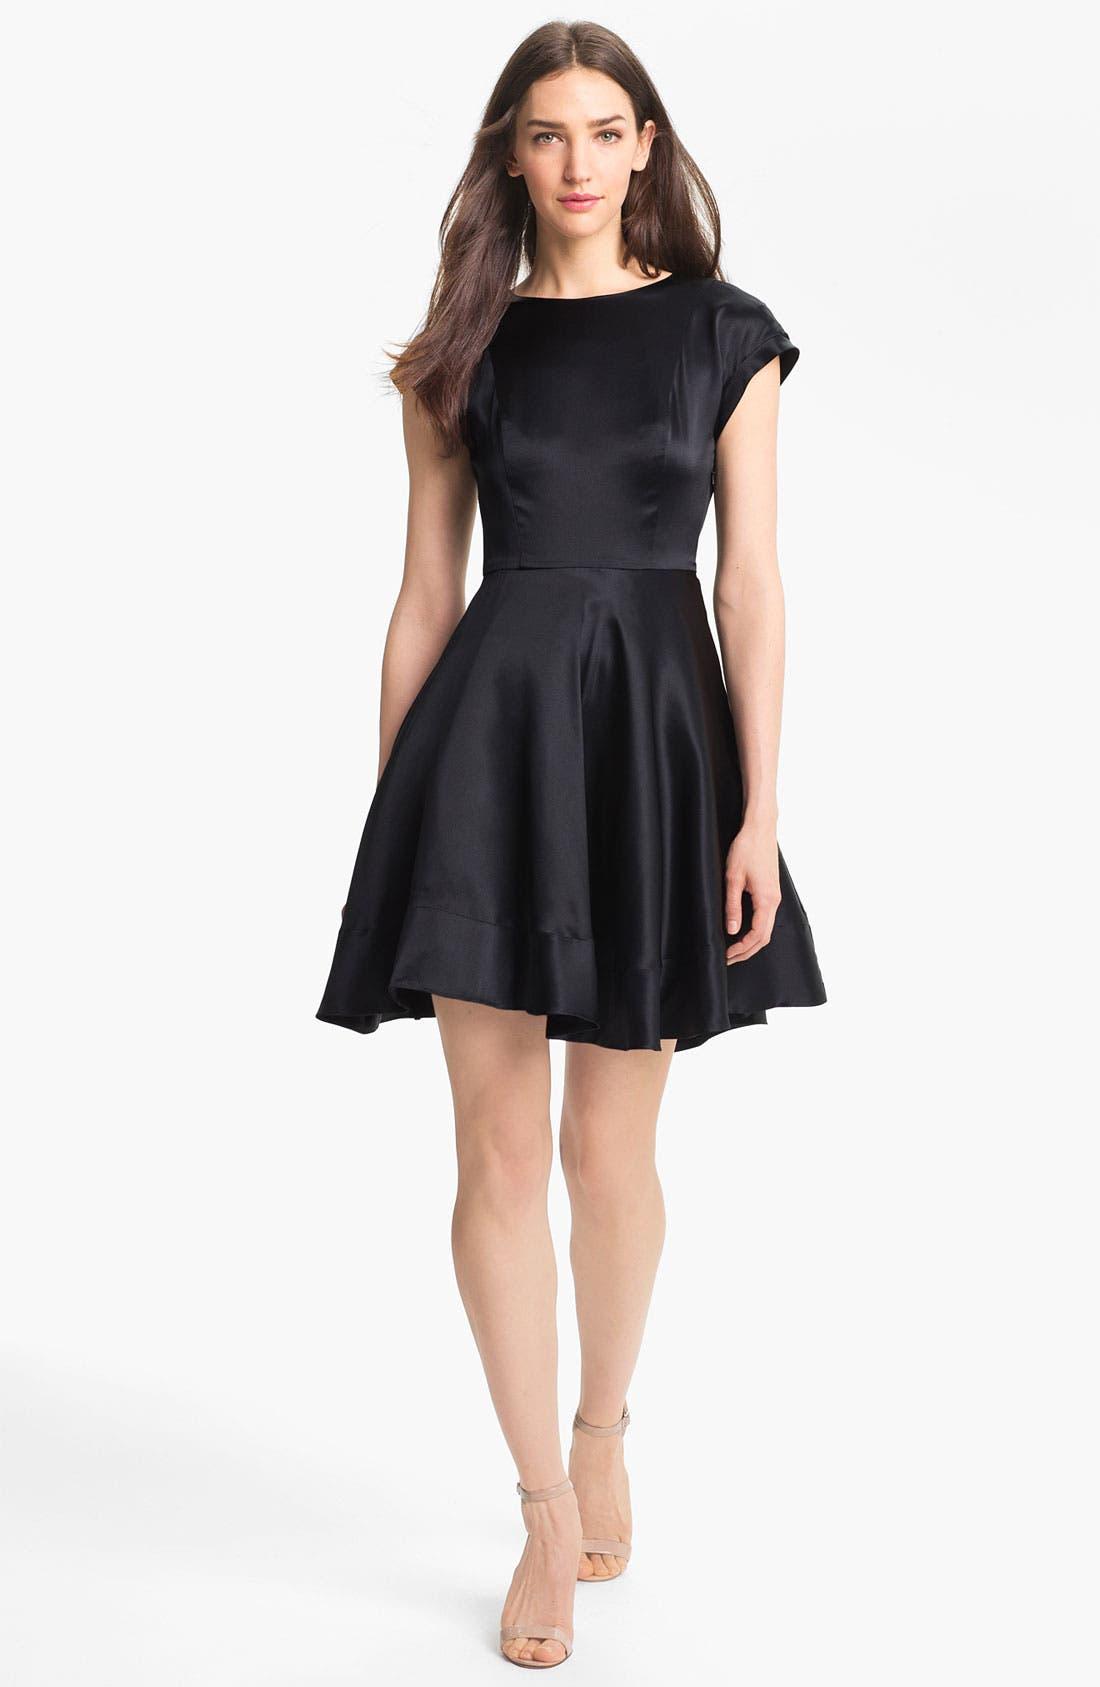 Alternate Image 1 Selected - Ted Baker London Silk Fit & Flare Dress